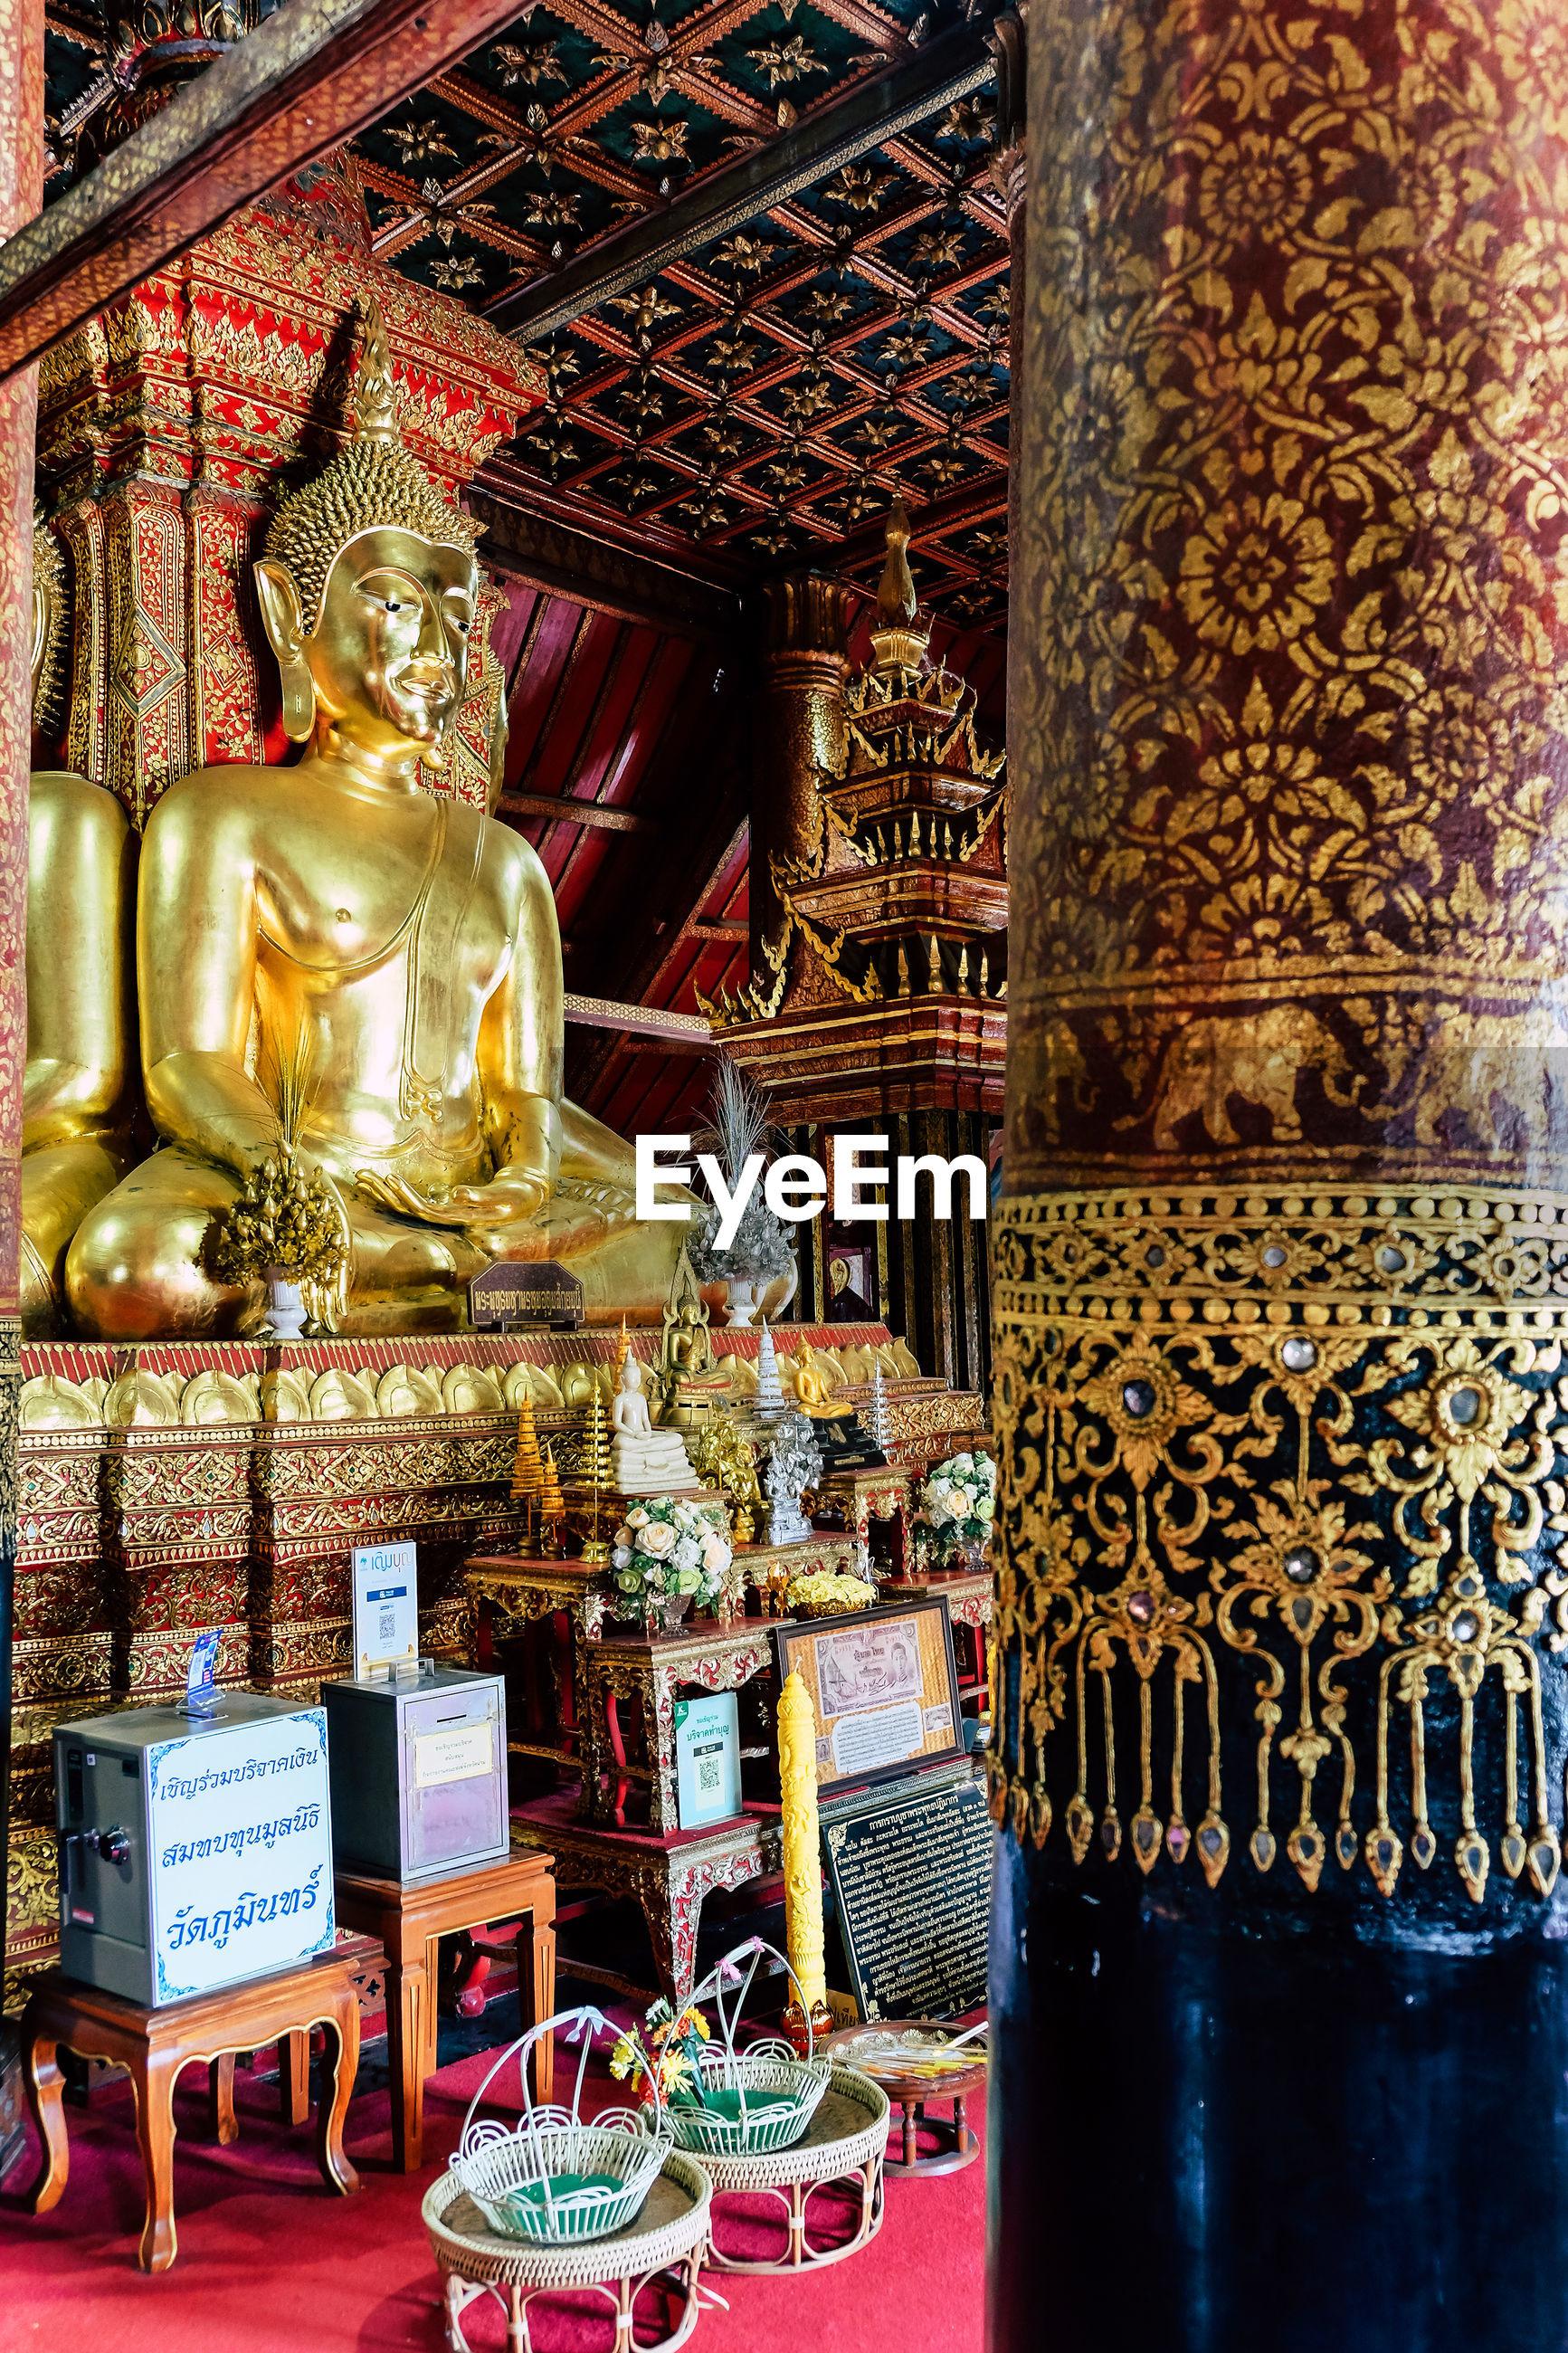 BUDDHA STATUE IN TEMPLE BUILDING